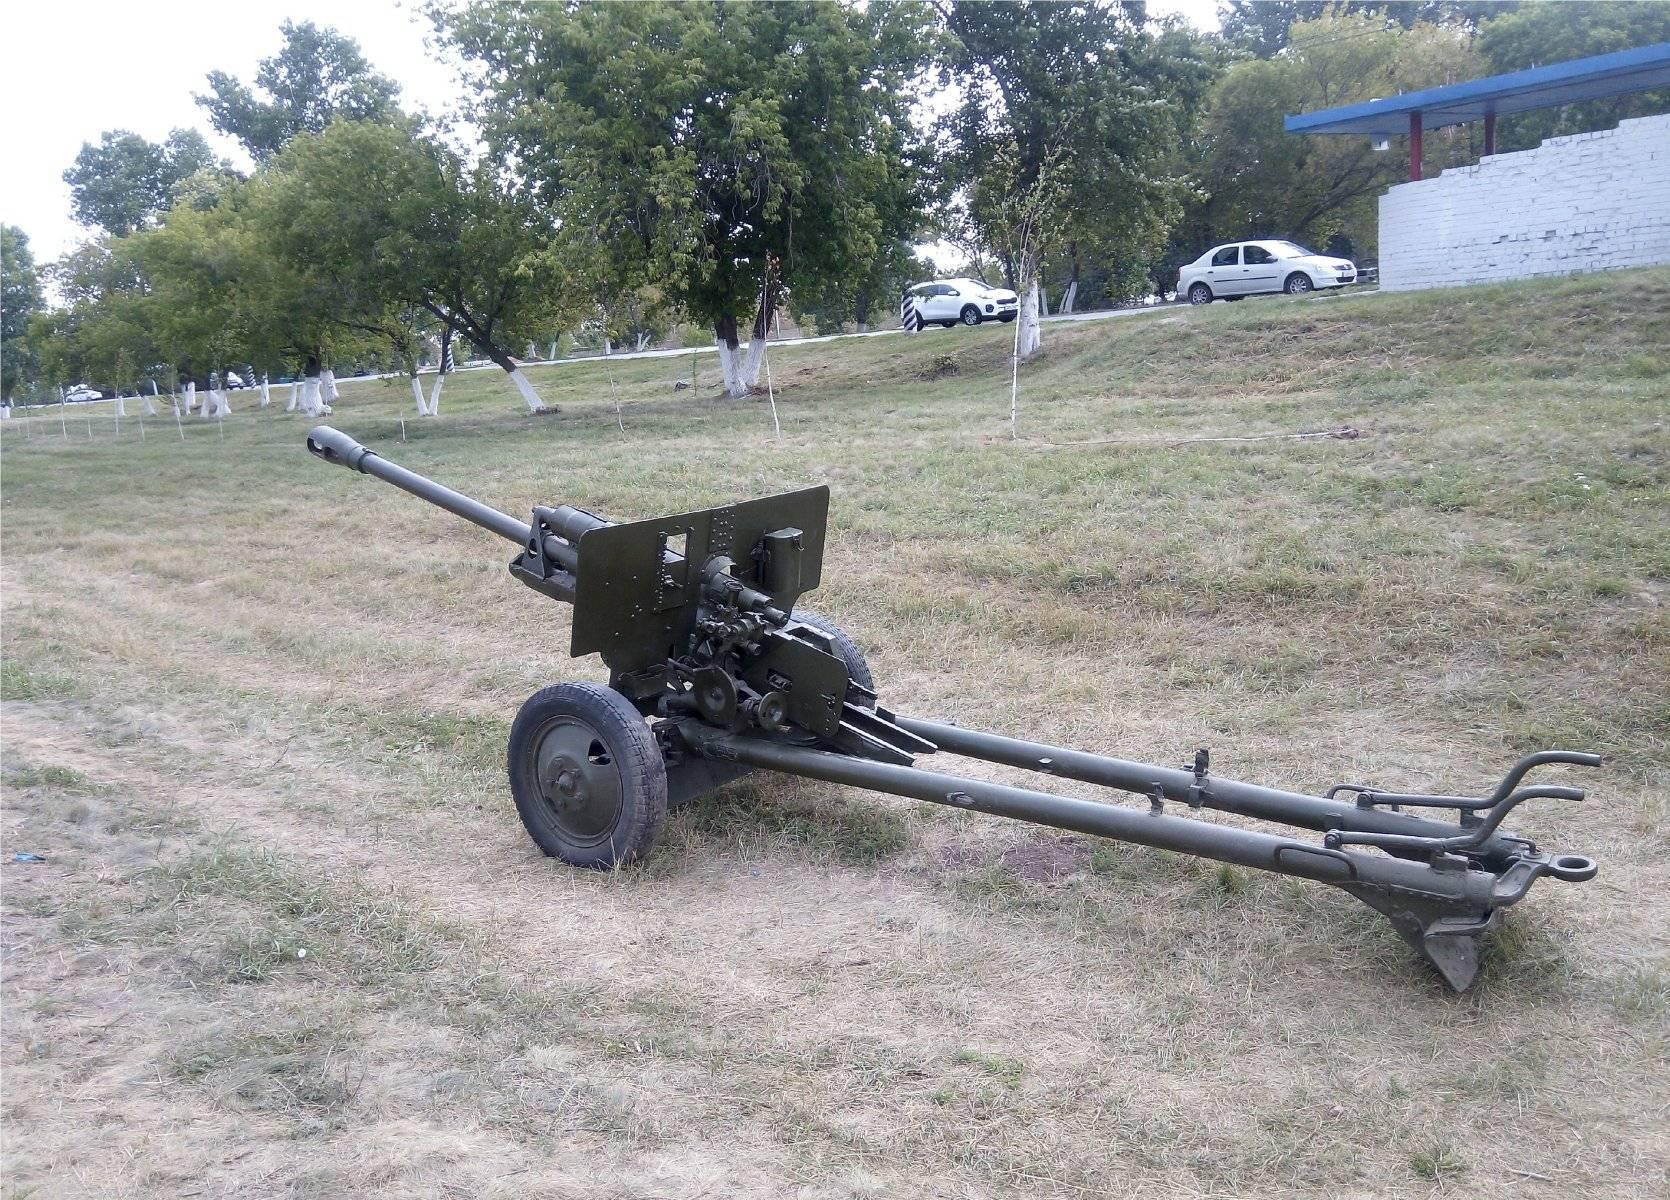 76 мм дивизионная пушка m1942 (зис-3) - 76 mm divisional gun m1942 (zis-3)